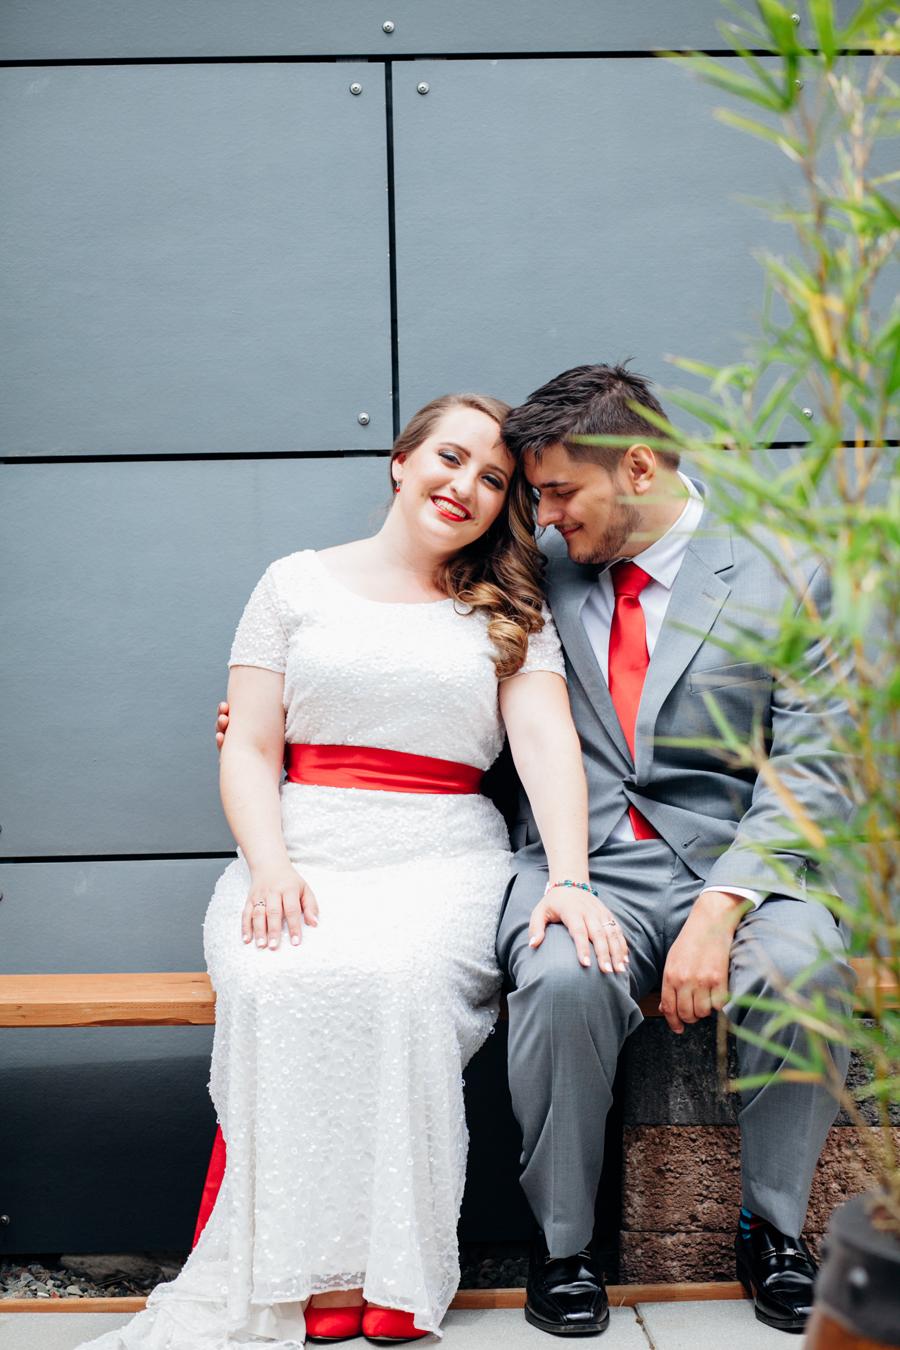 022-central-cinema-seattle-washington-wedding-kaheryn-moran-photography.jpg